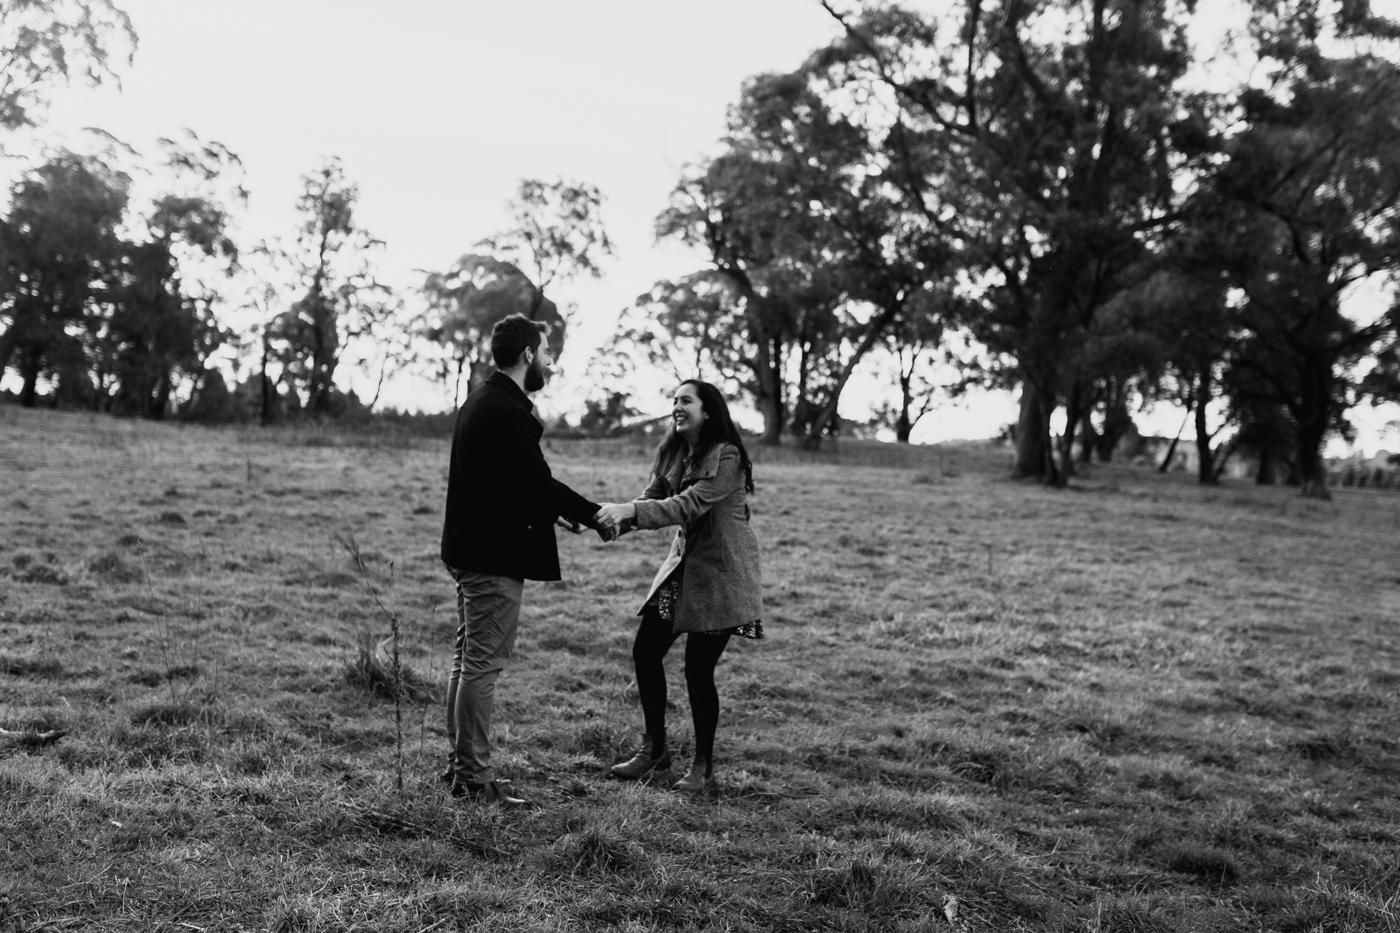 Kate & Kieran - Southern Highlands Engagement - Samantha Heather Photography-74.jpg